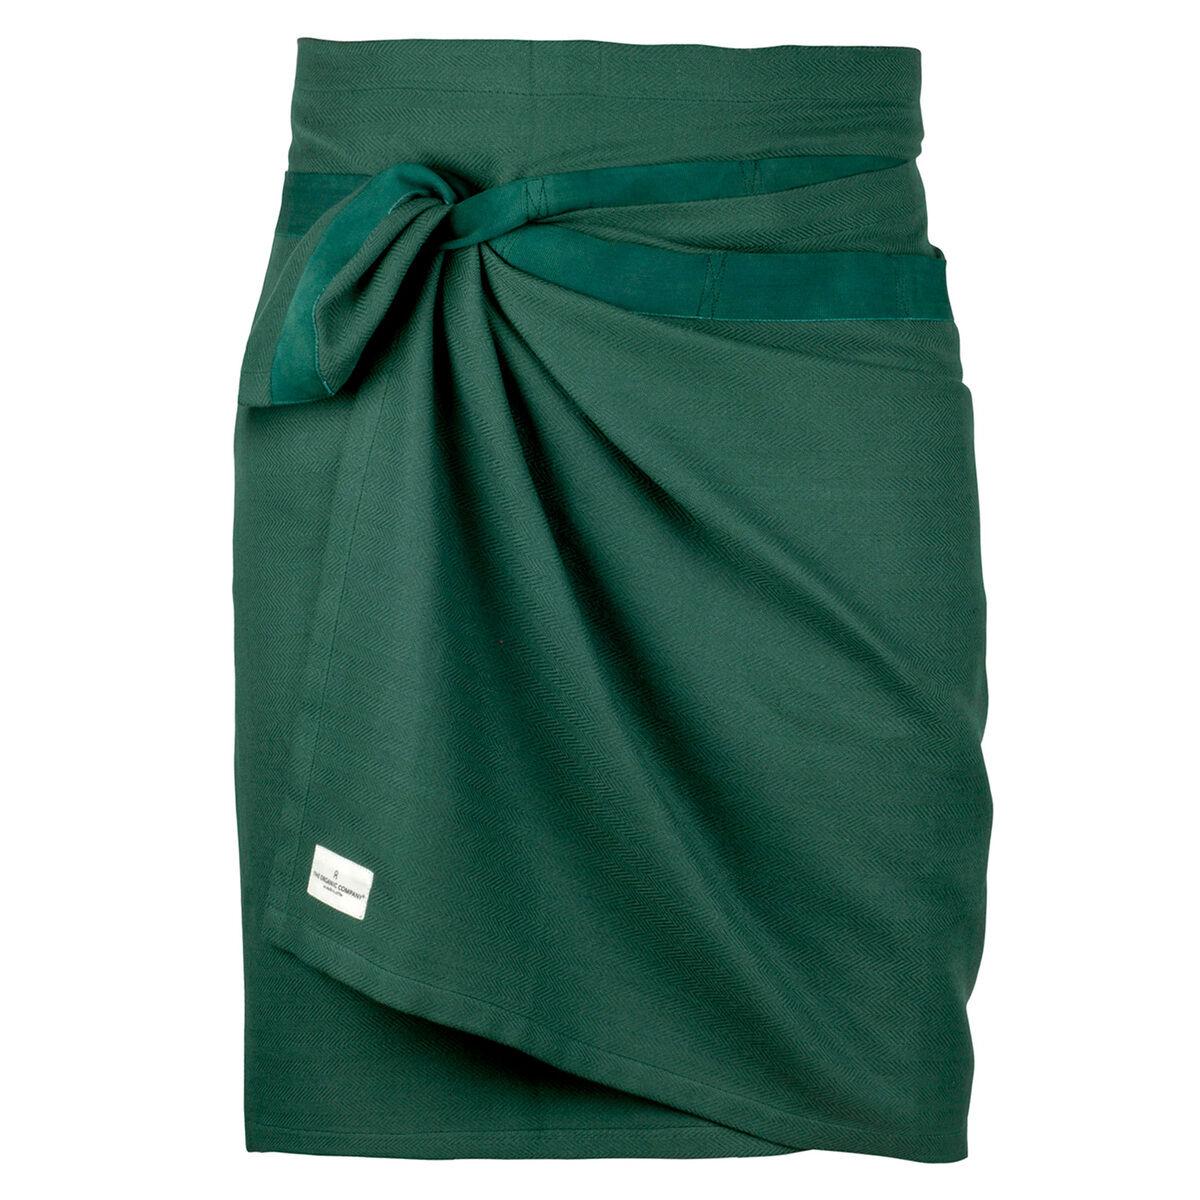 The Organic Company Giant kitchen towel/apron, dark green